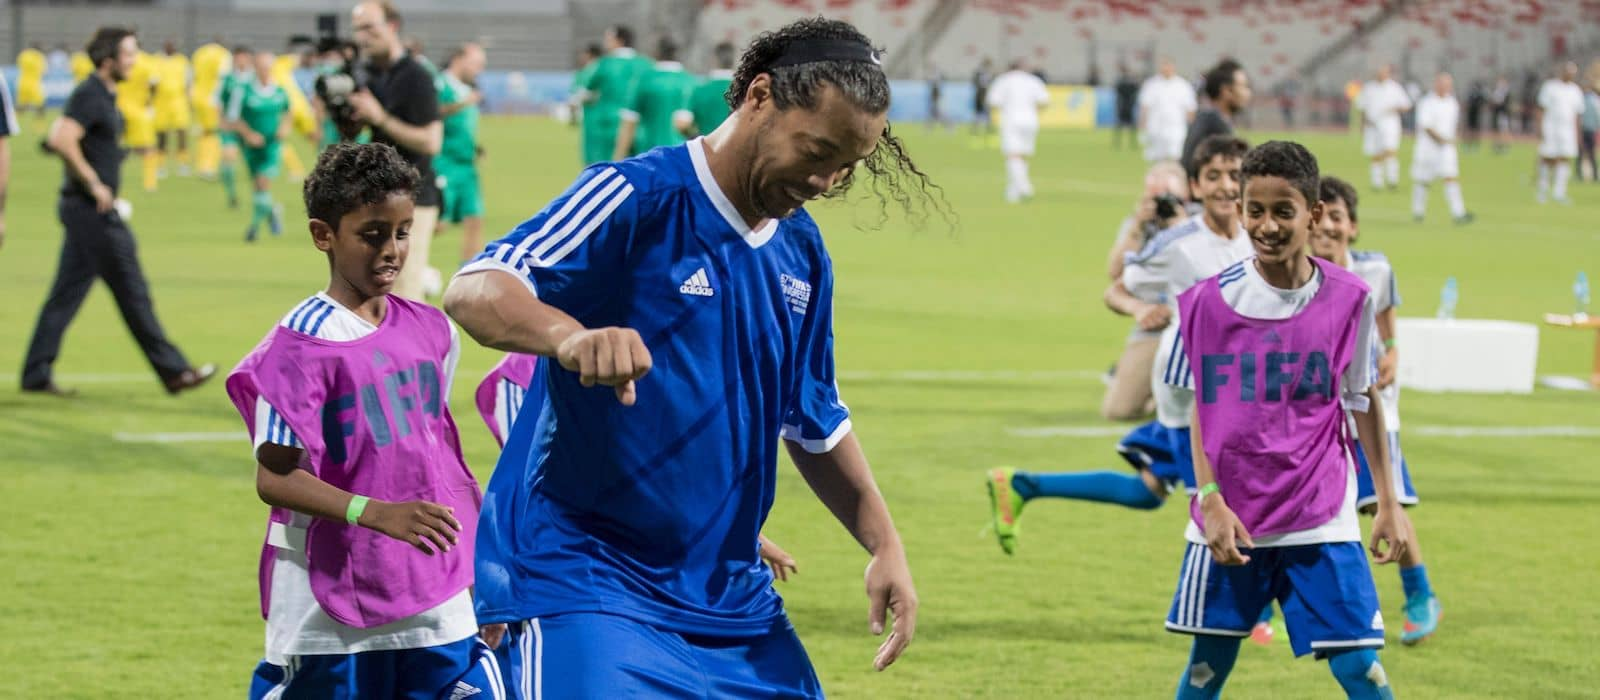 Video: Ronaldinho embarrasses Jesper Blomqvist with mesmerising skill during legends game